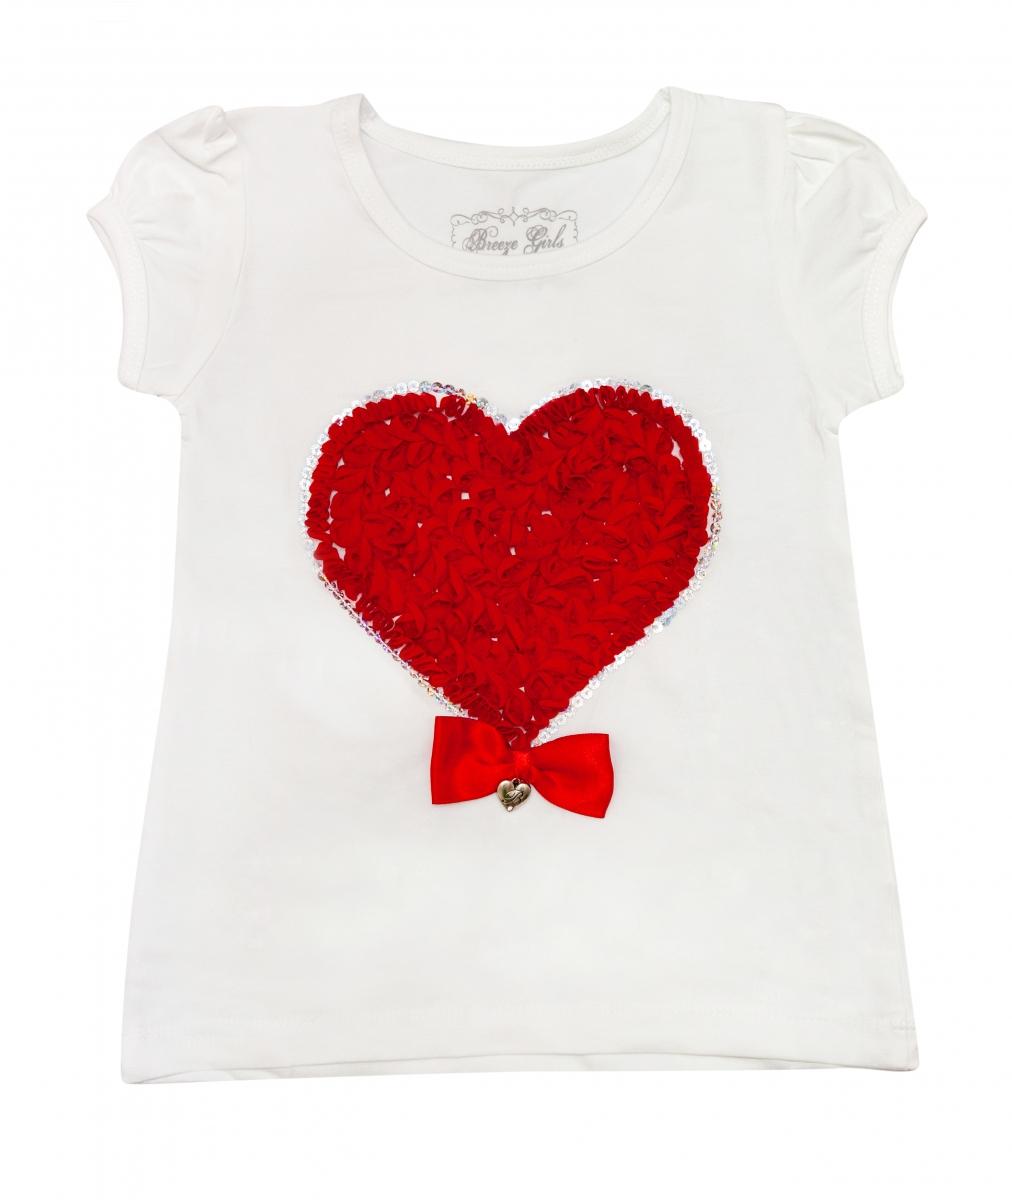 Tricouri fete breeze 1704 alb rosu 98-134cm